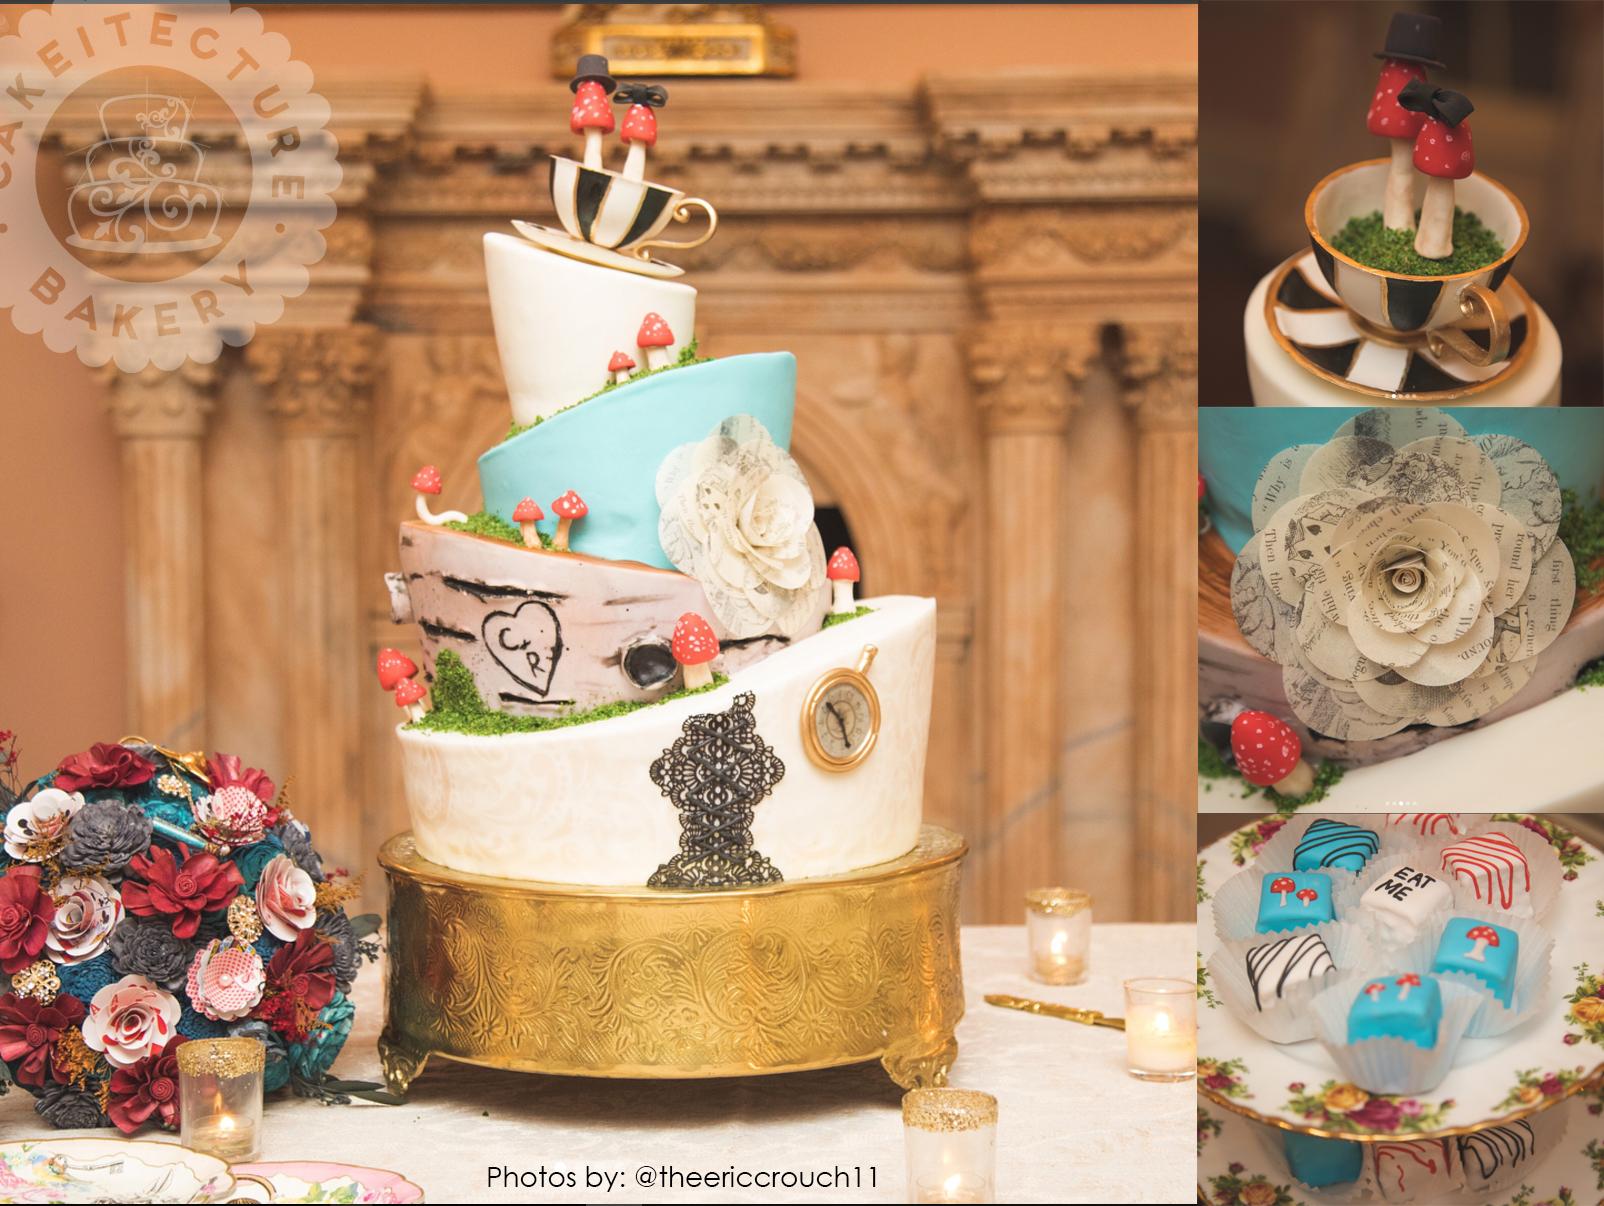 Cakeitecture Bakery 1703 Alice in Wonderland wedding cake .jpg